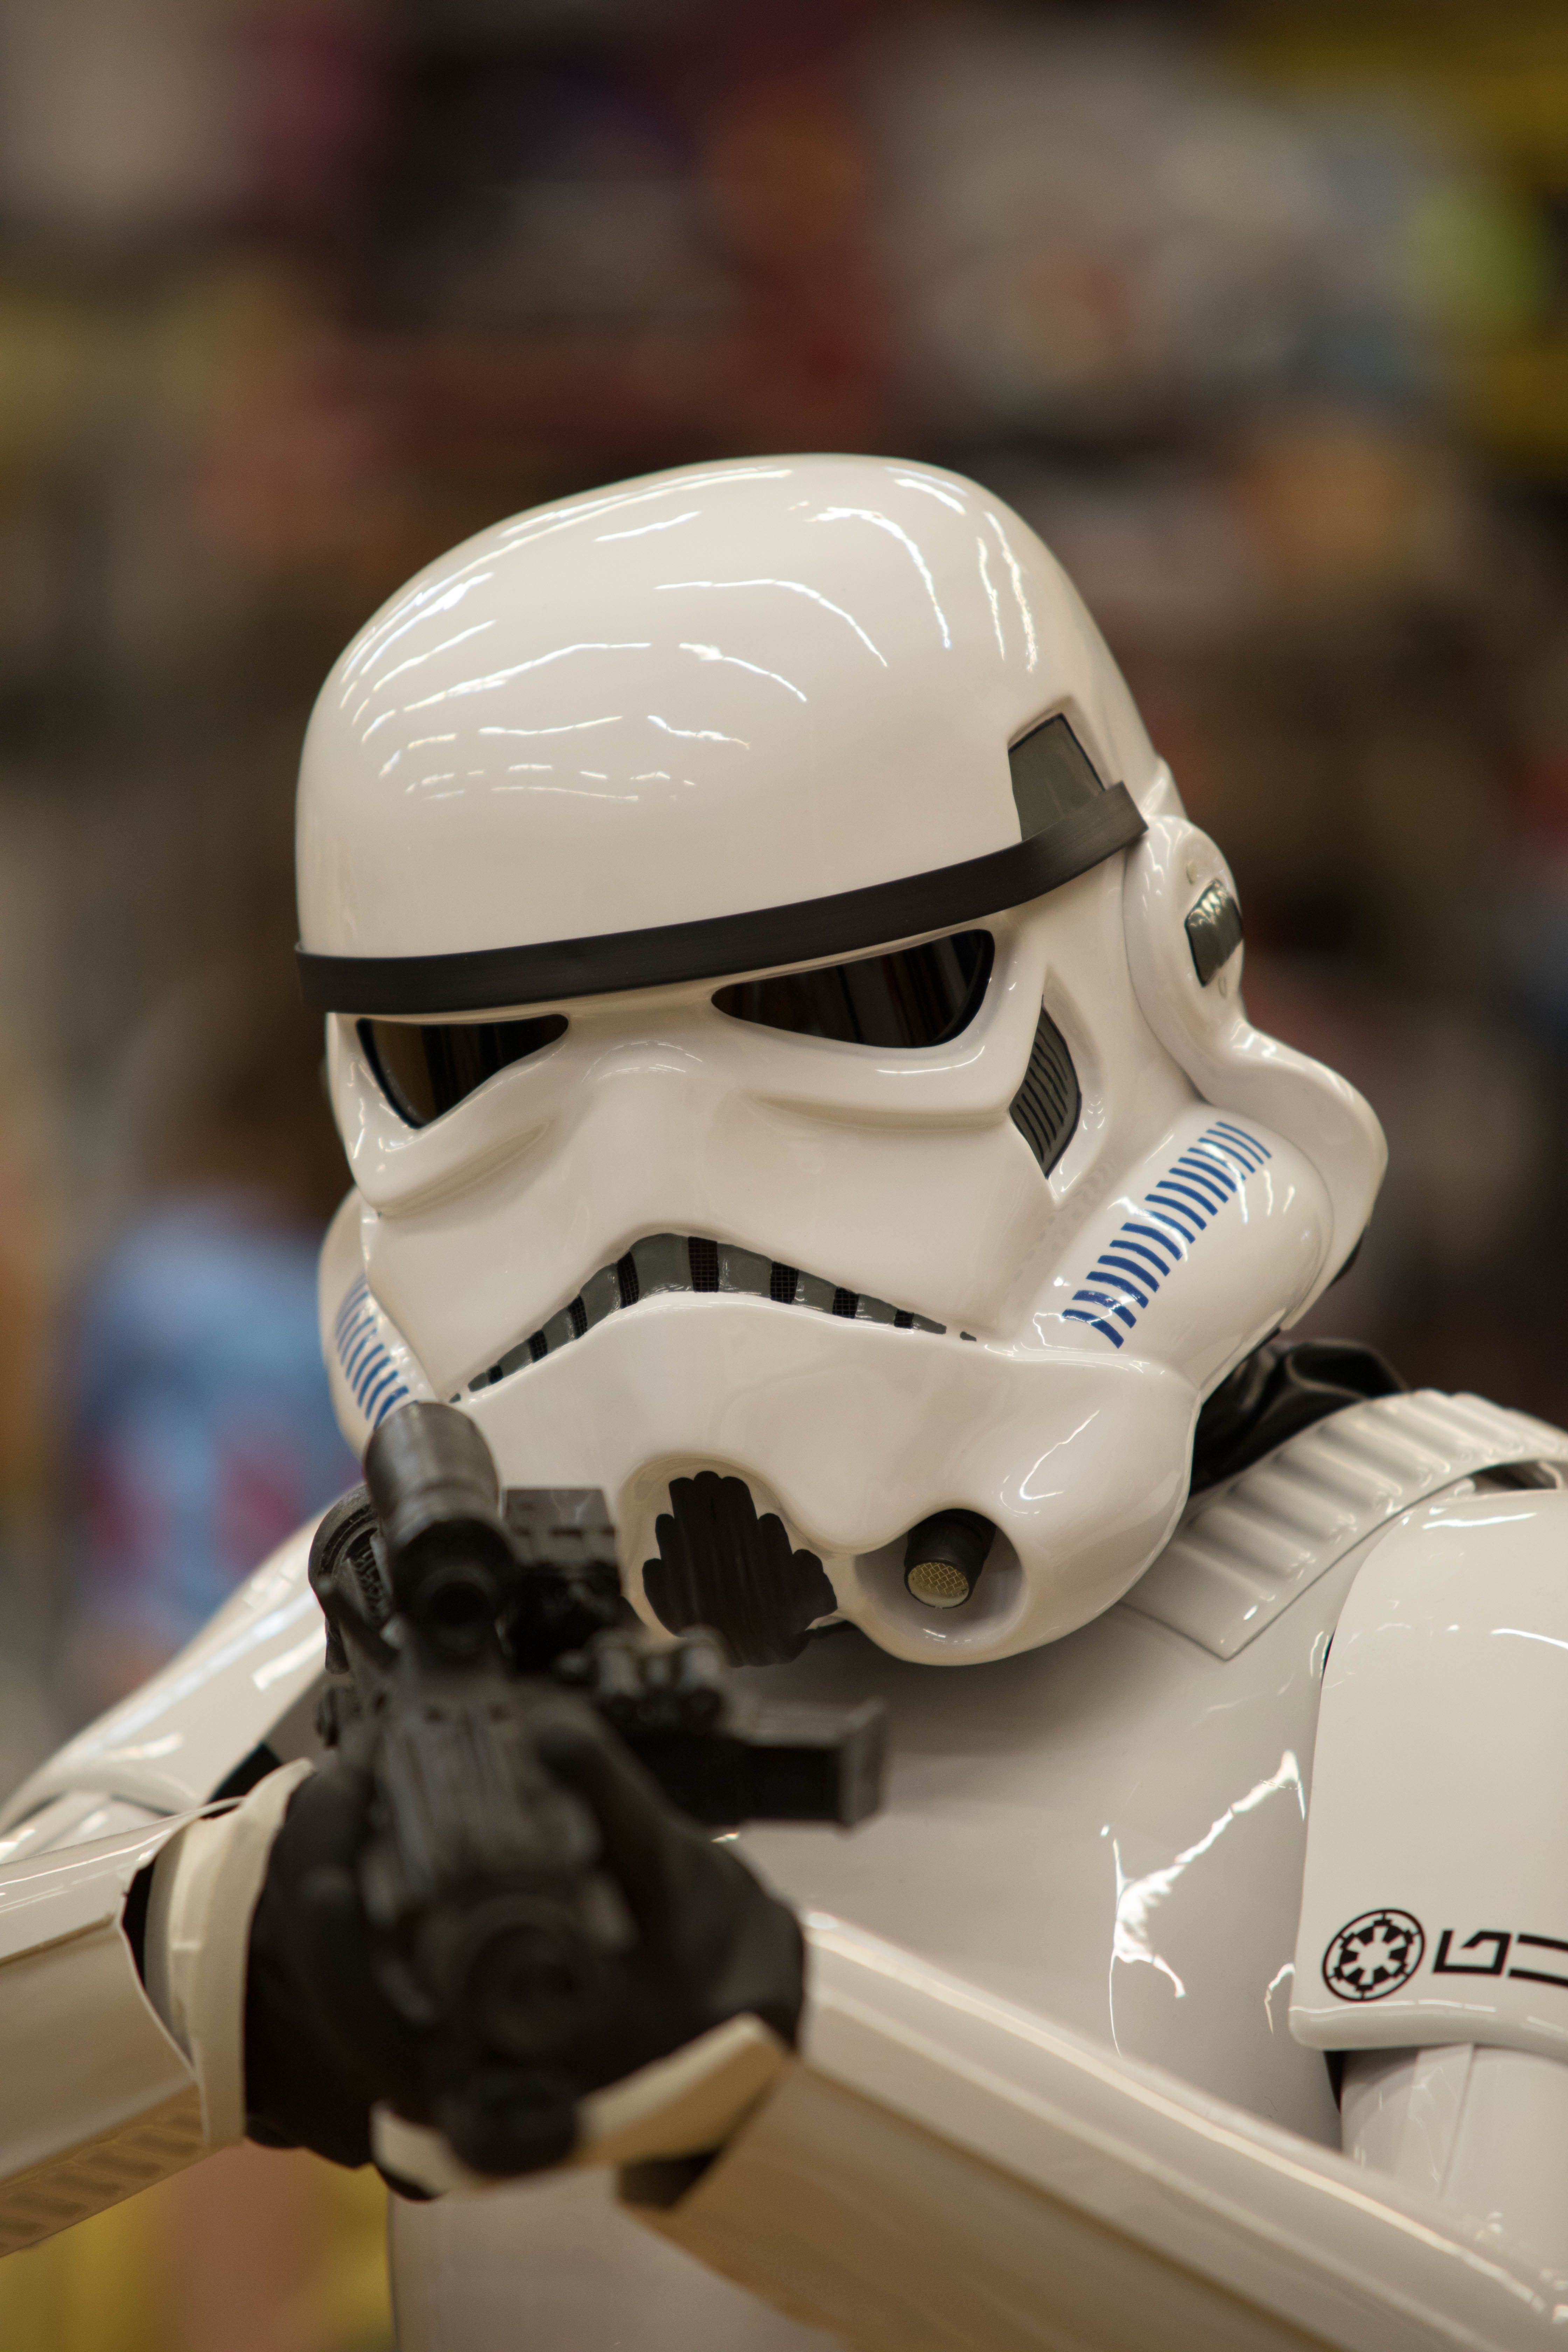 Papercraft Stormtrooper Helmet Stormtrooper Tries to Aim Stormtroopers